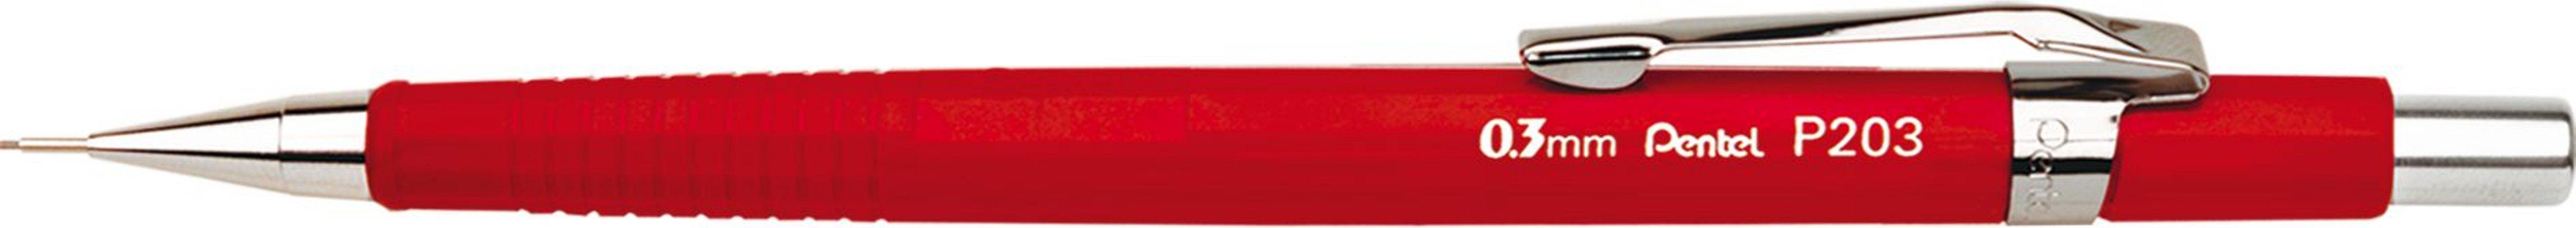 Lapiseira Pentel 0.3 Sharp P203 Vermelha